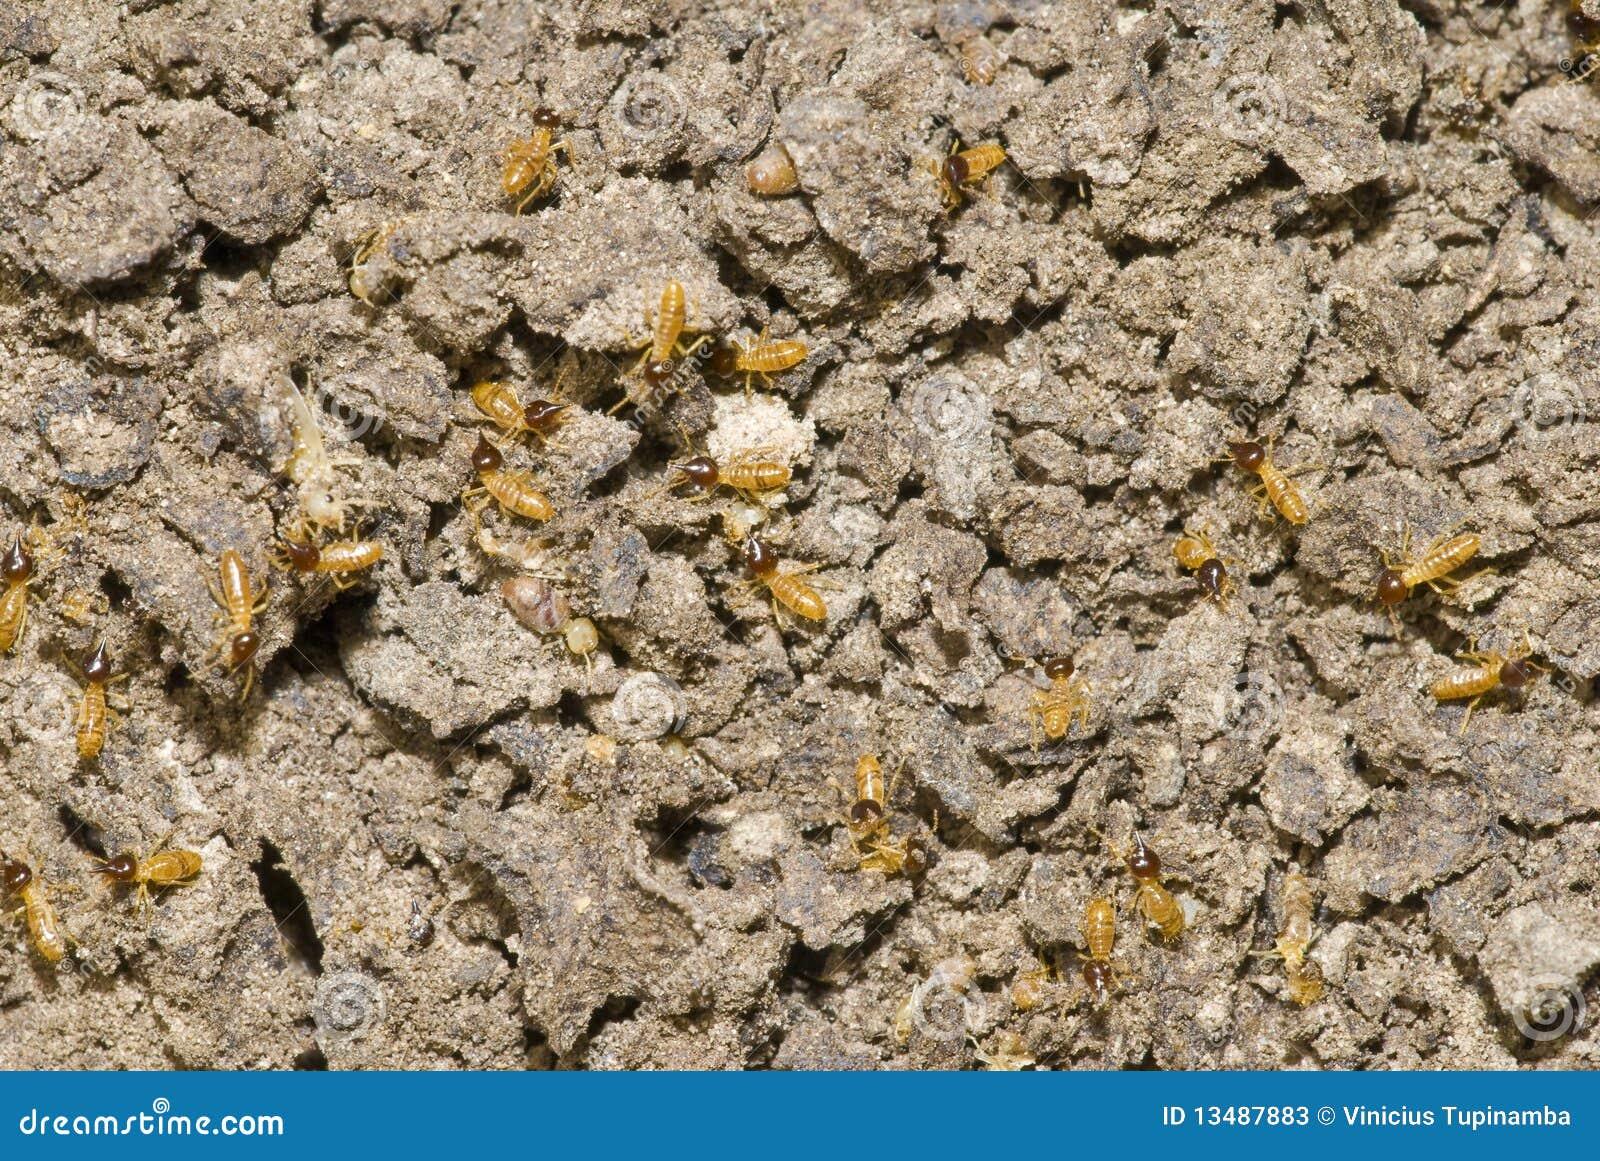 Kolonia termity